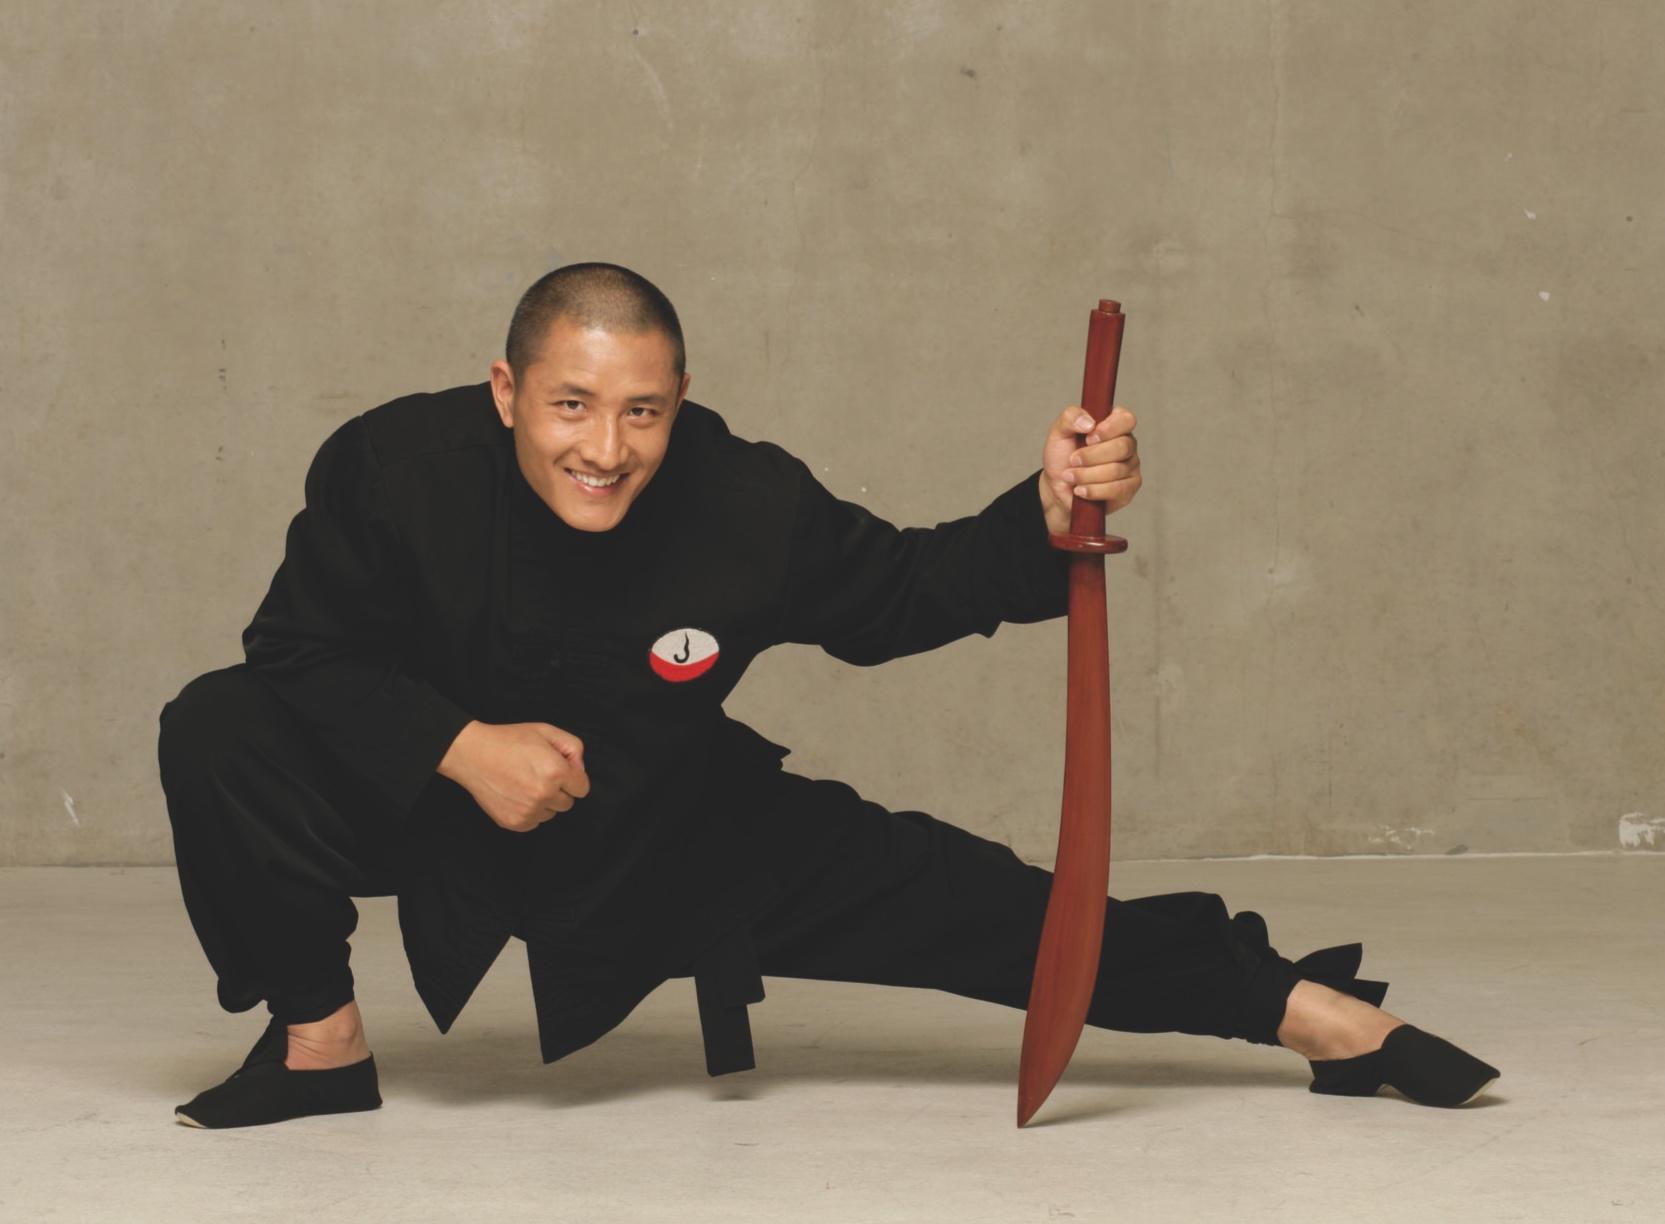 Tulku Lobsang Rinpoche, Tibetan Master, Doctor of Tibetan medicine, and Founder of the Tog Chöd practice.